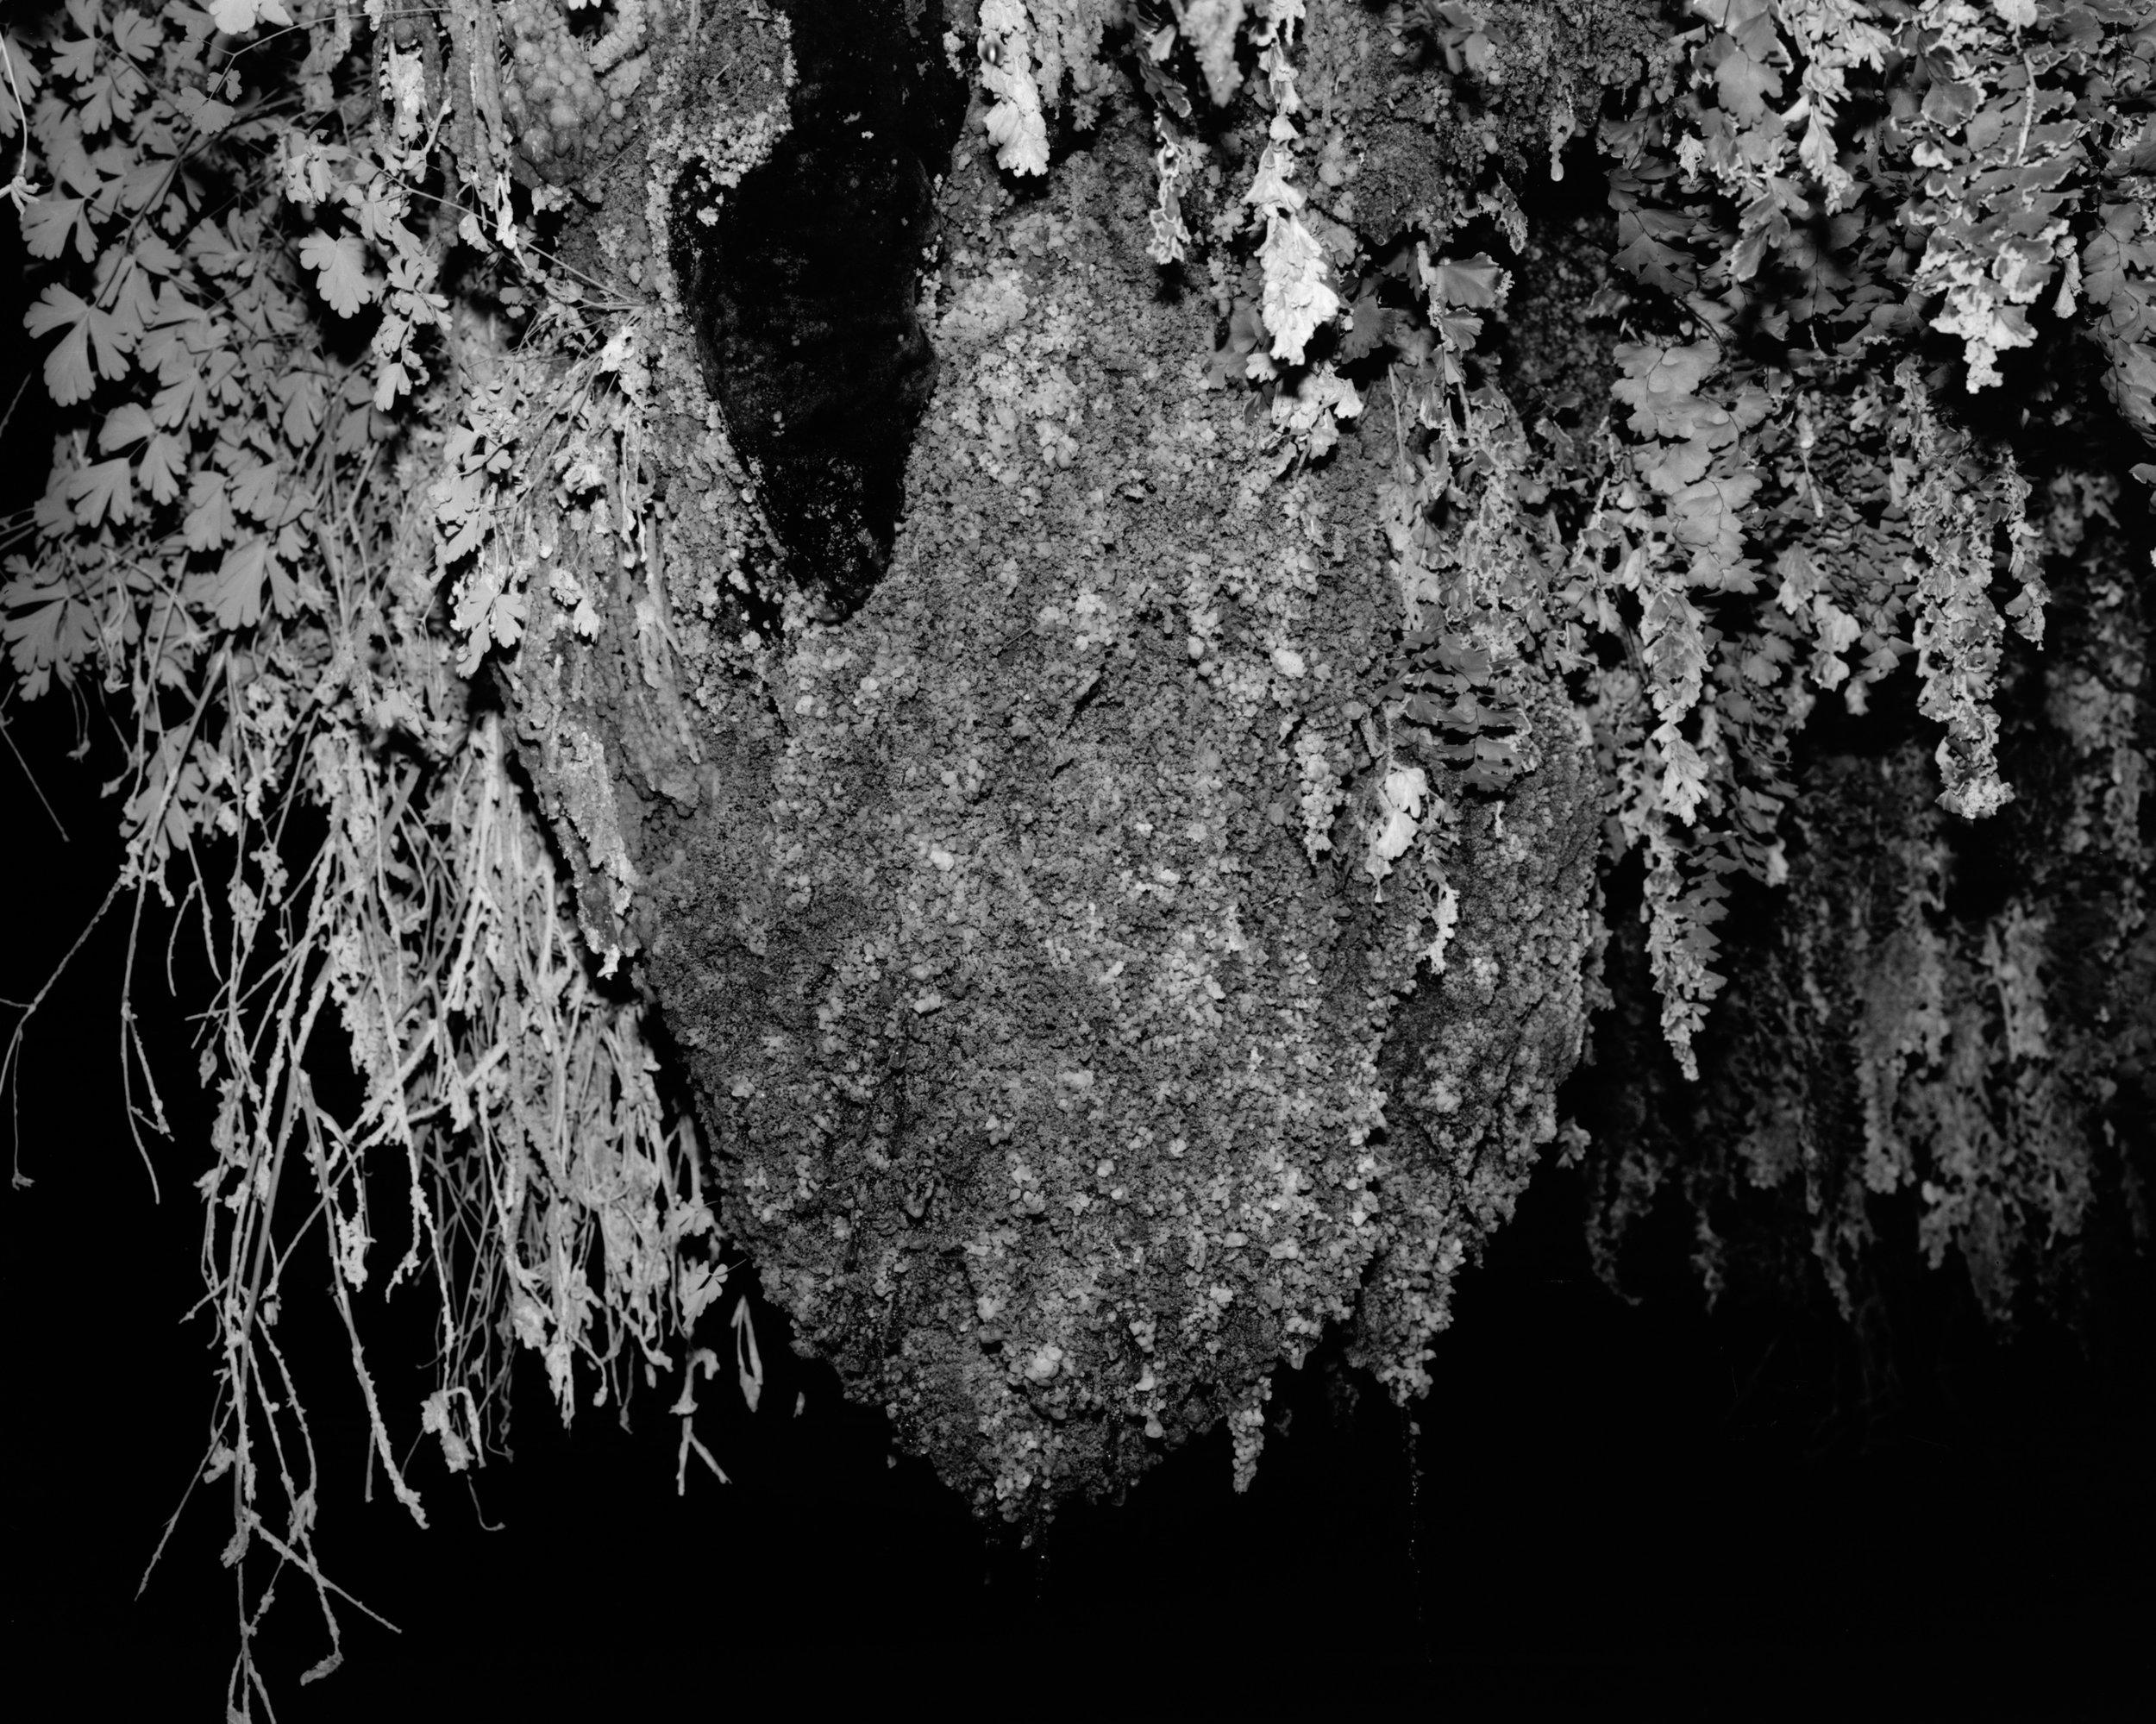 MICHAEL LUNDGREN  Garden, 2014  Gelatin silver print 32 x 40 in ed. 7 + 1AP